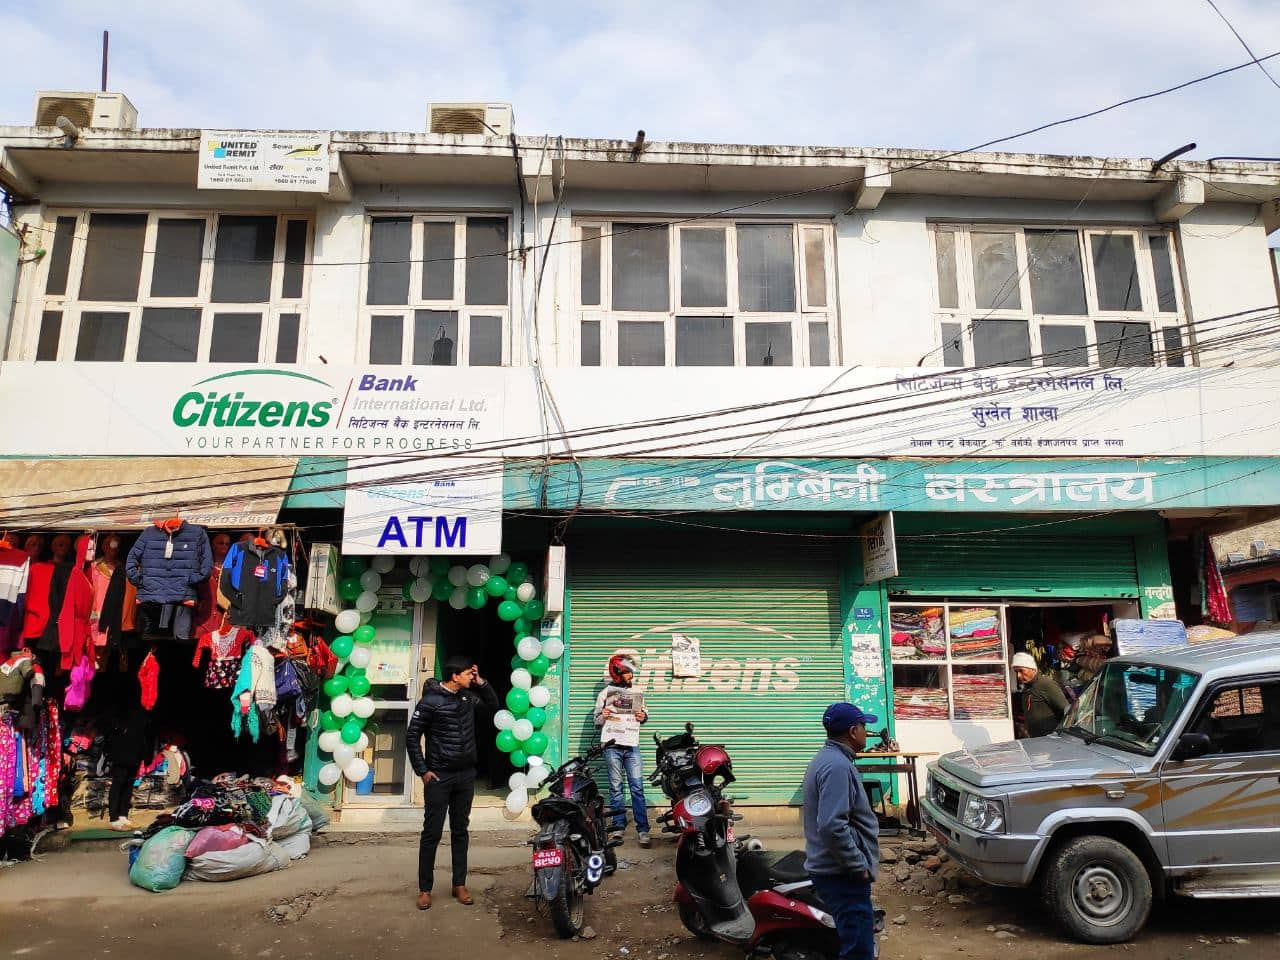 सिटिजन्स बैंकद्वारा कर्णाली प्रदेशको प्रादेशिक कार्यालय सुर्खेतमा स्थापना